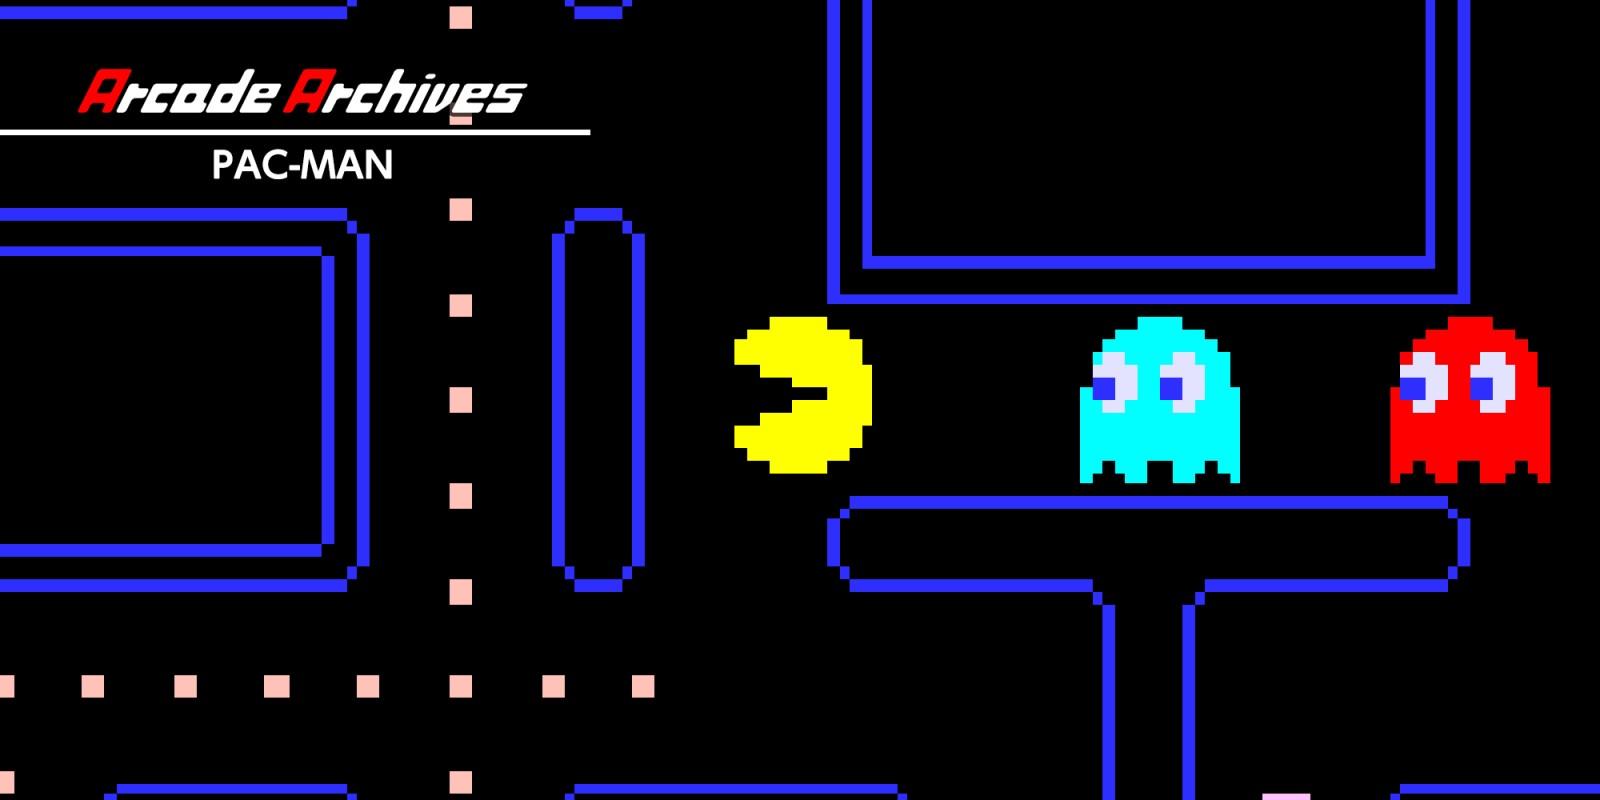 Arcade Archives PAC-MAN